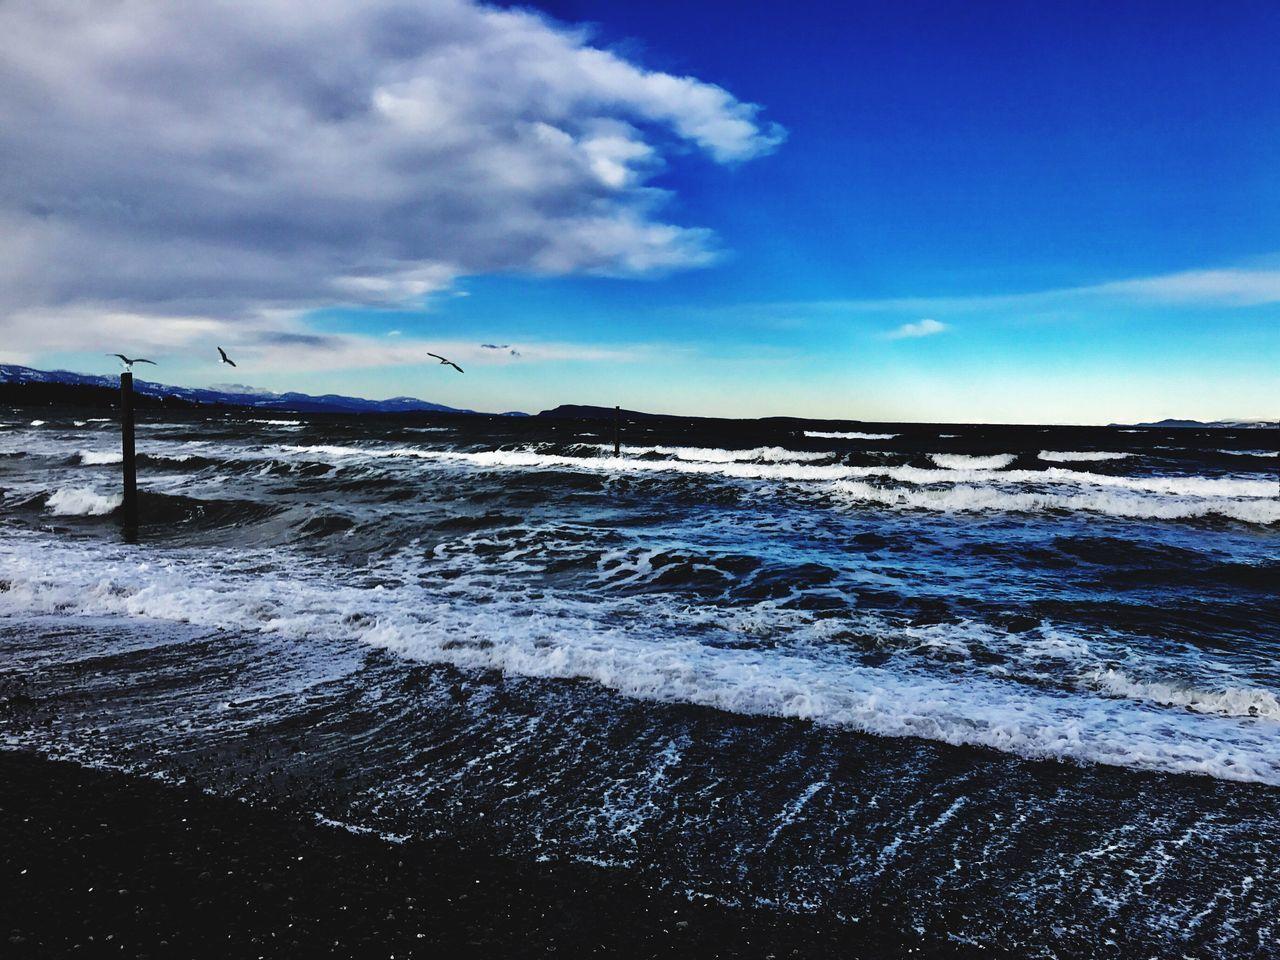 EyeEmNewHere Oceanside Sky Nature Beauty In Nature Horizon Over Water Wave Beach Tranquil Scene Cloud - Sky Sea Qualicum Beach Islandlife Vancouver Island Beautifulbc Zen Powerful Power In Nature Seabirds Stormyseas Beach Life